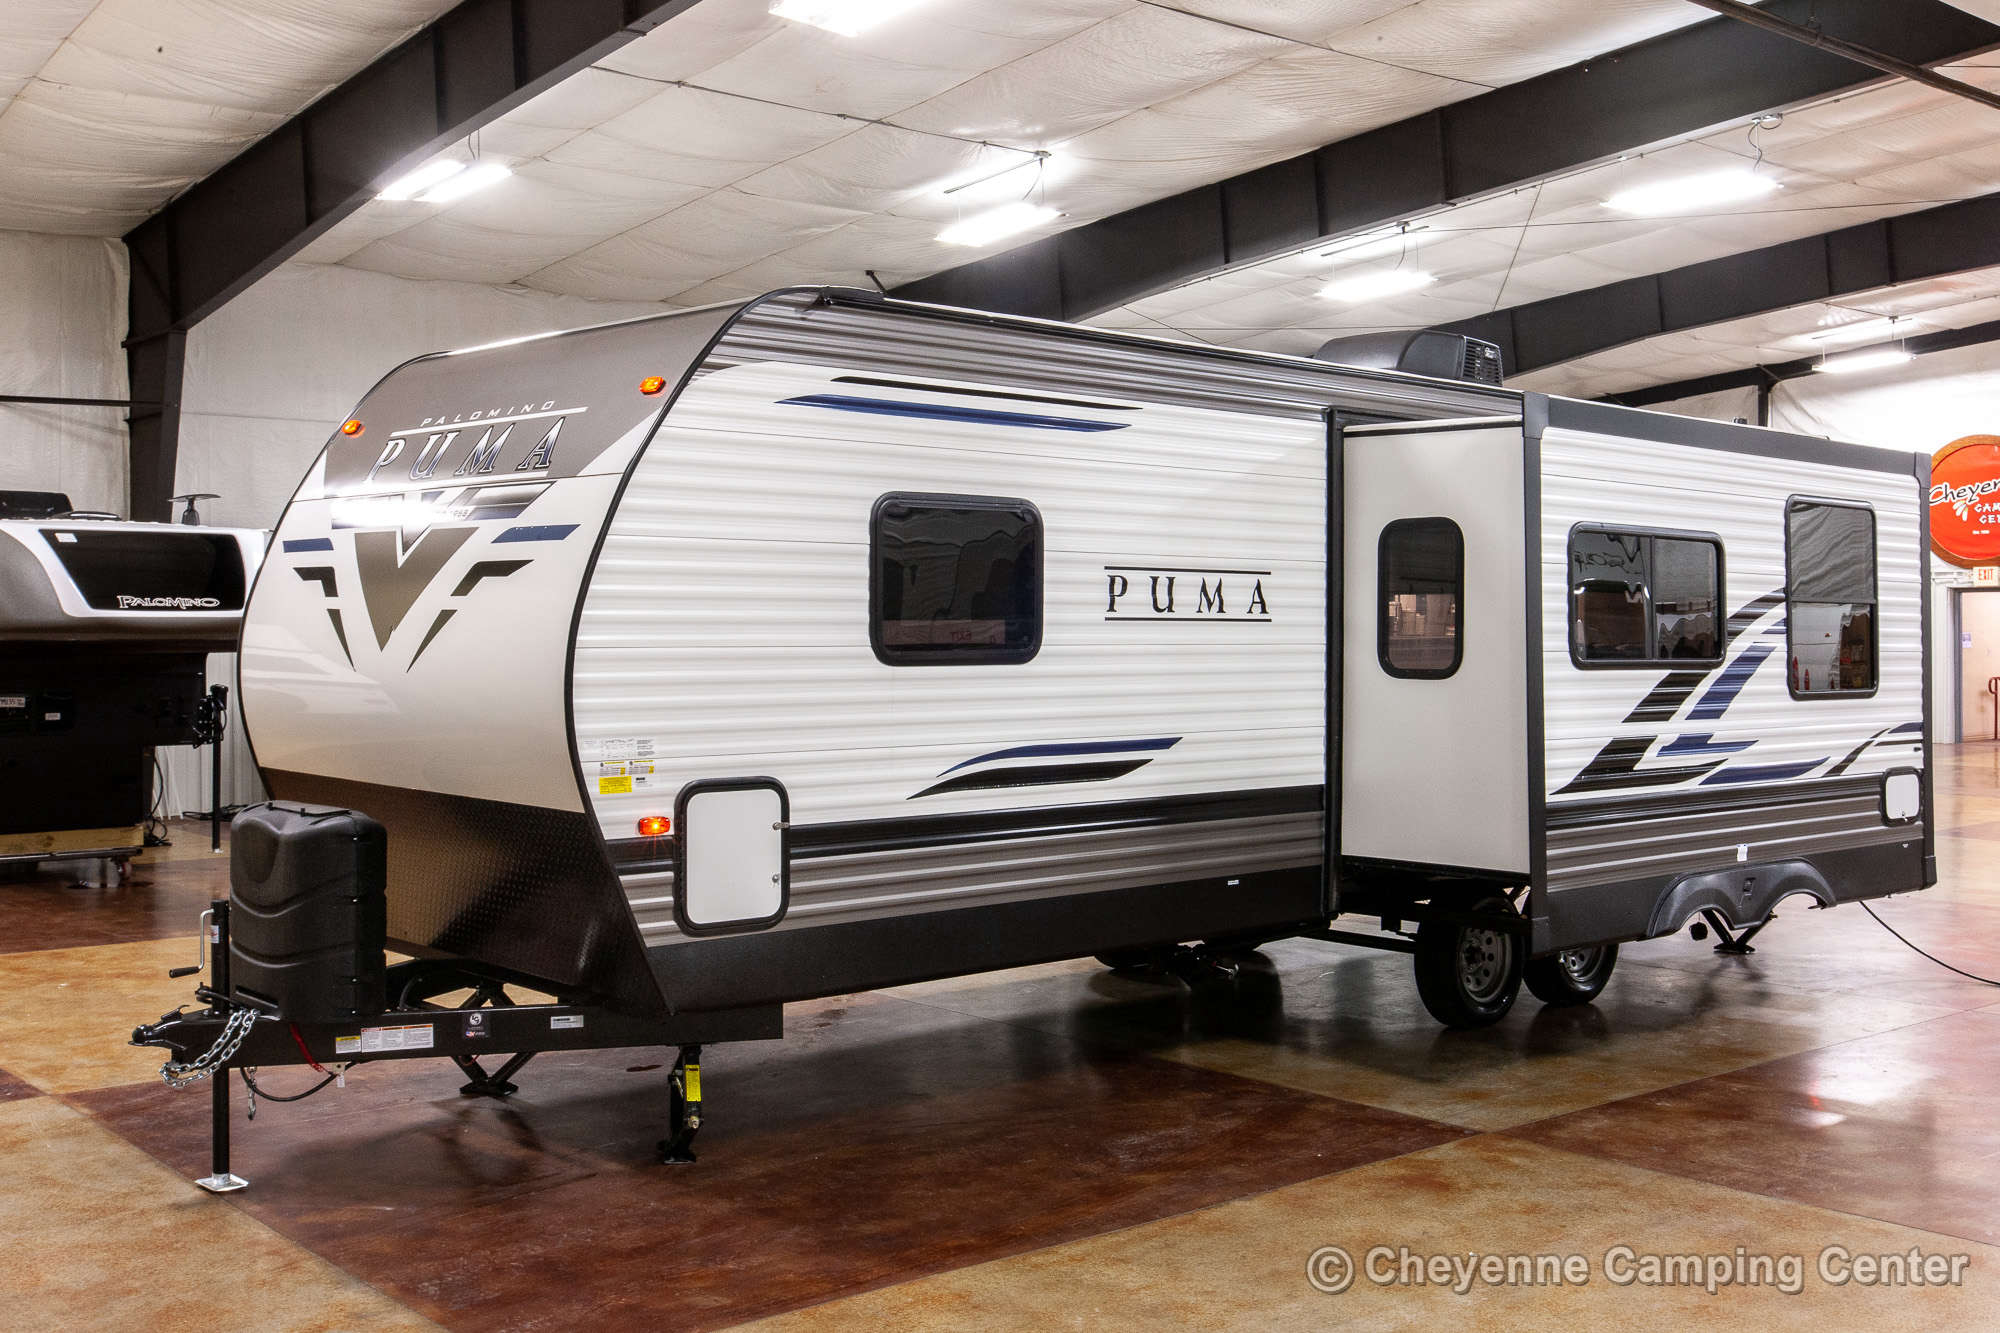 2022 Palomino Puma 25RKQB Travel Trailer Exterior Image